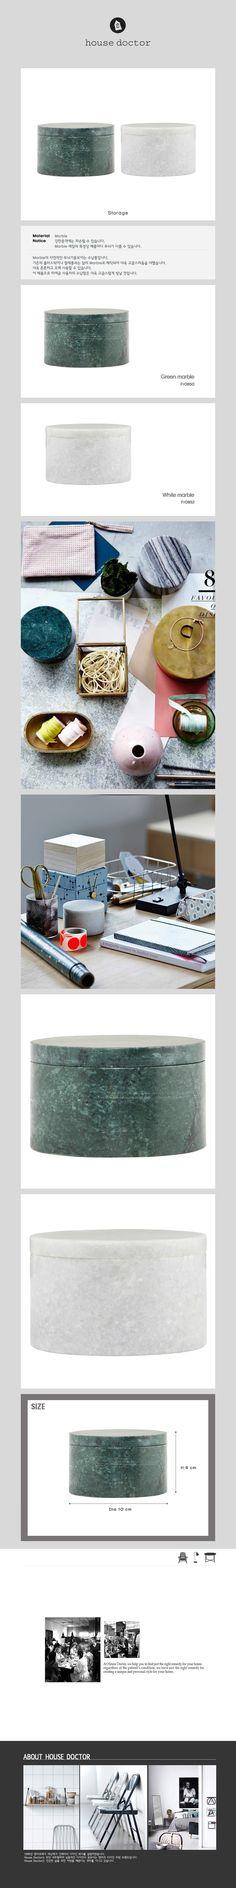 House Doctor Storage Marble green 대리석 보관함 2가지 색상중 택1 : ICOMPANY